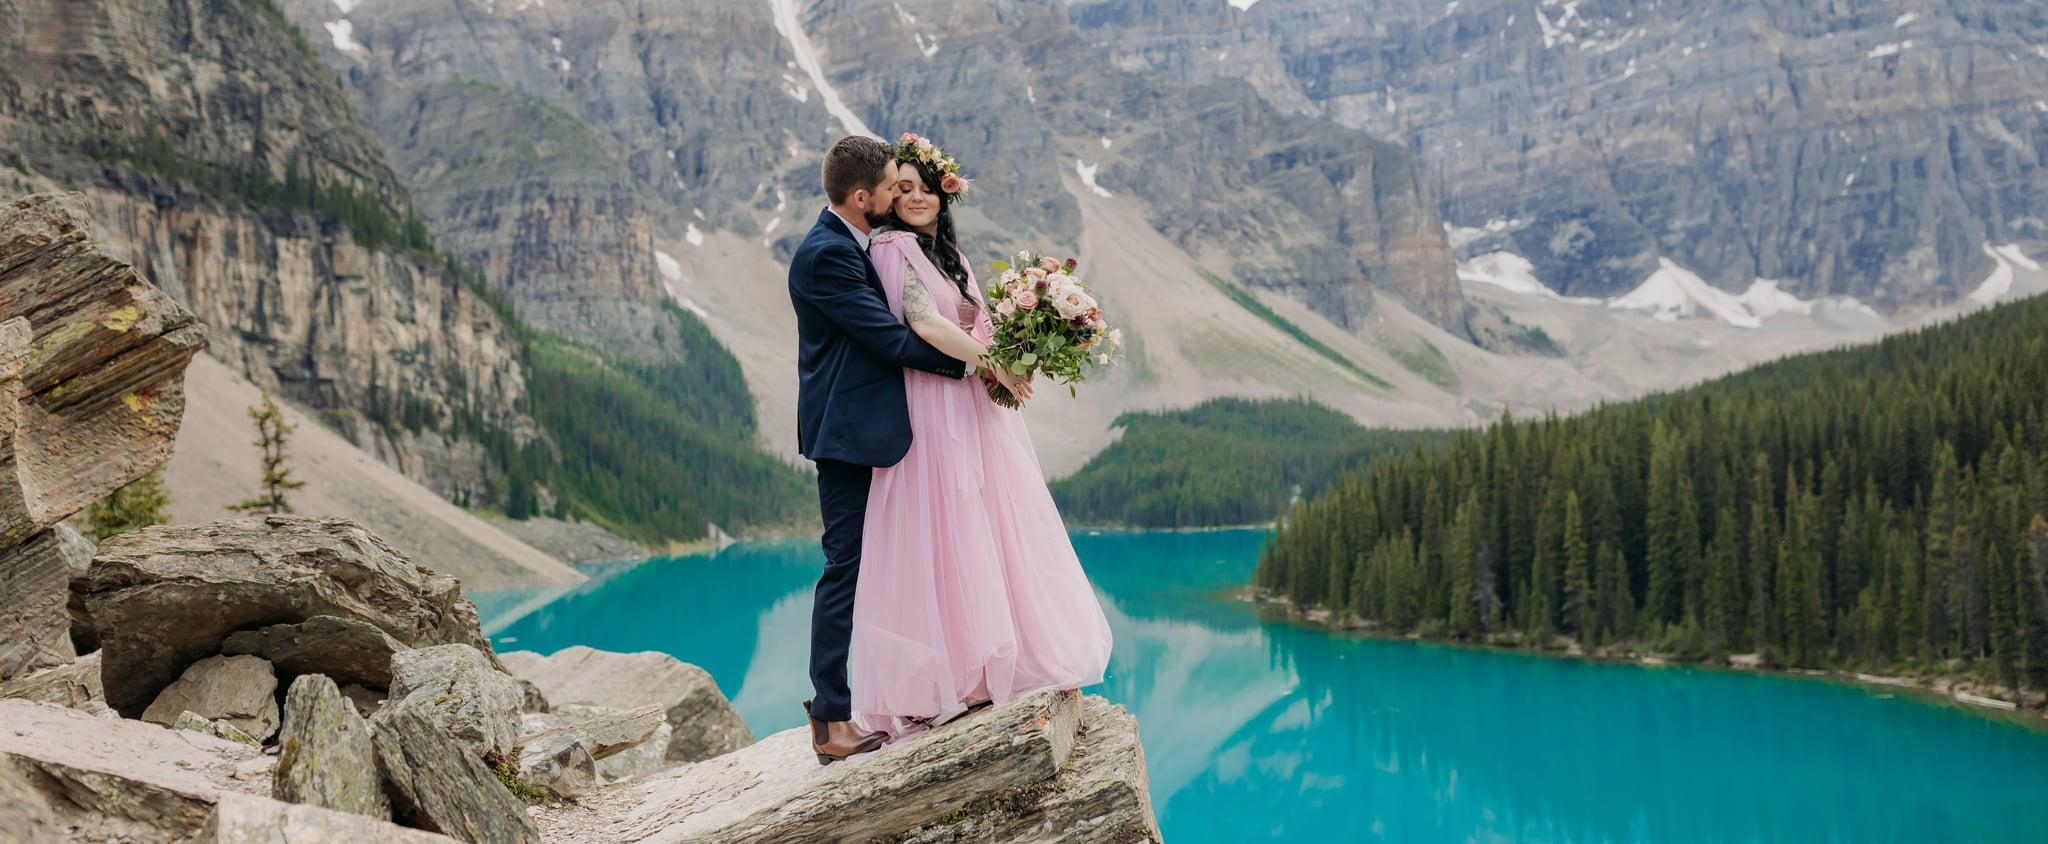 Elopement at Moraine Lake in Banff National Park